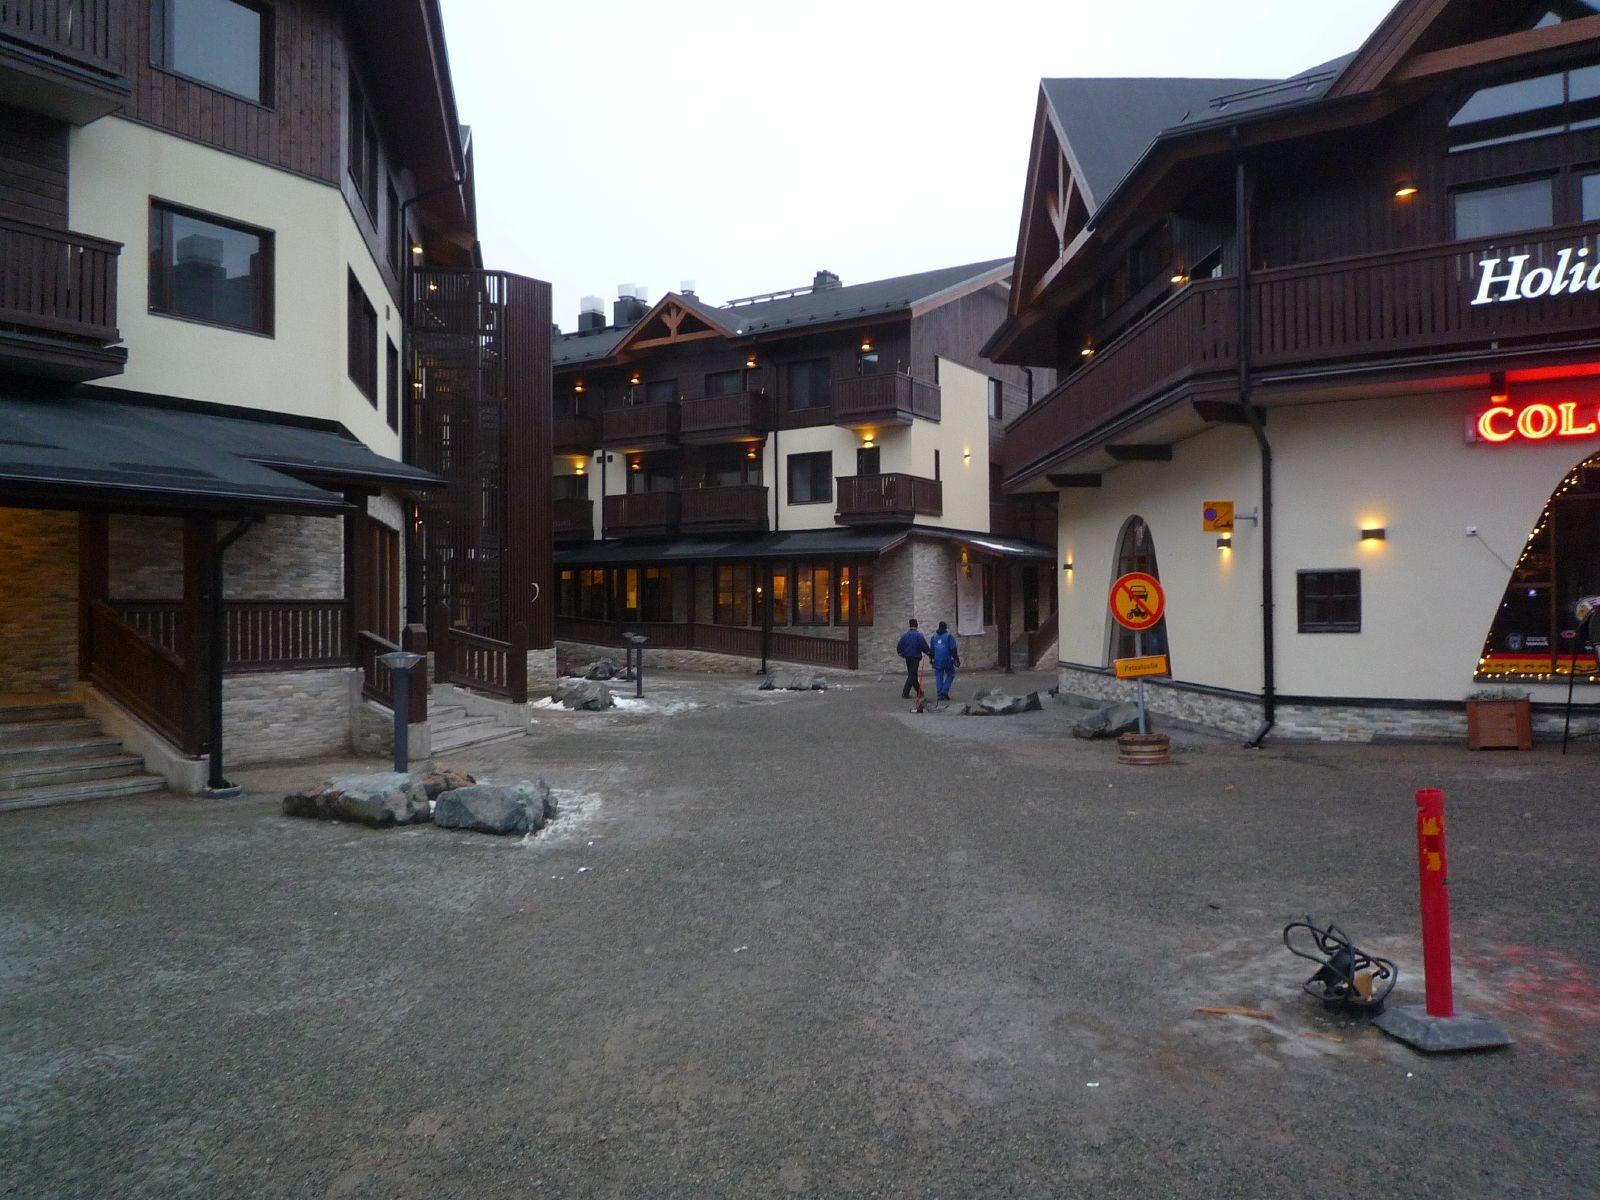 244028464_Ruka_village_Finland_2.jpg.fdecc49fa49ea4975c8530b84fb34022.jpg